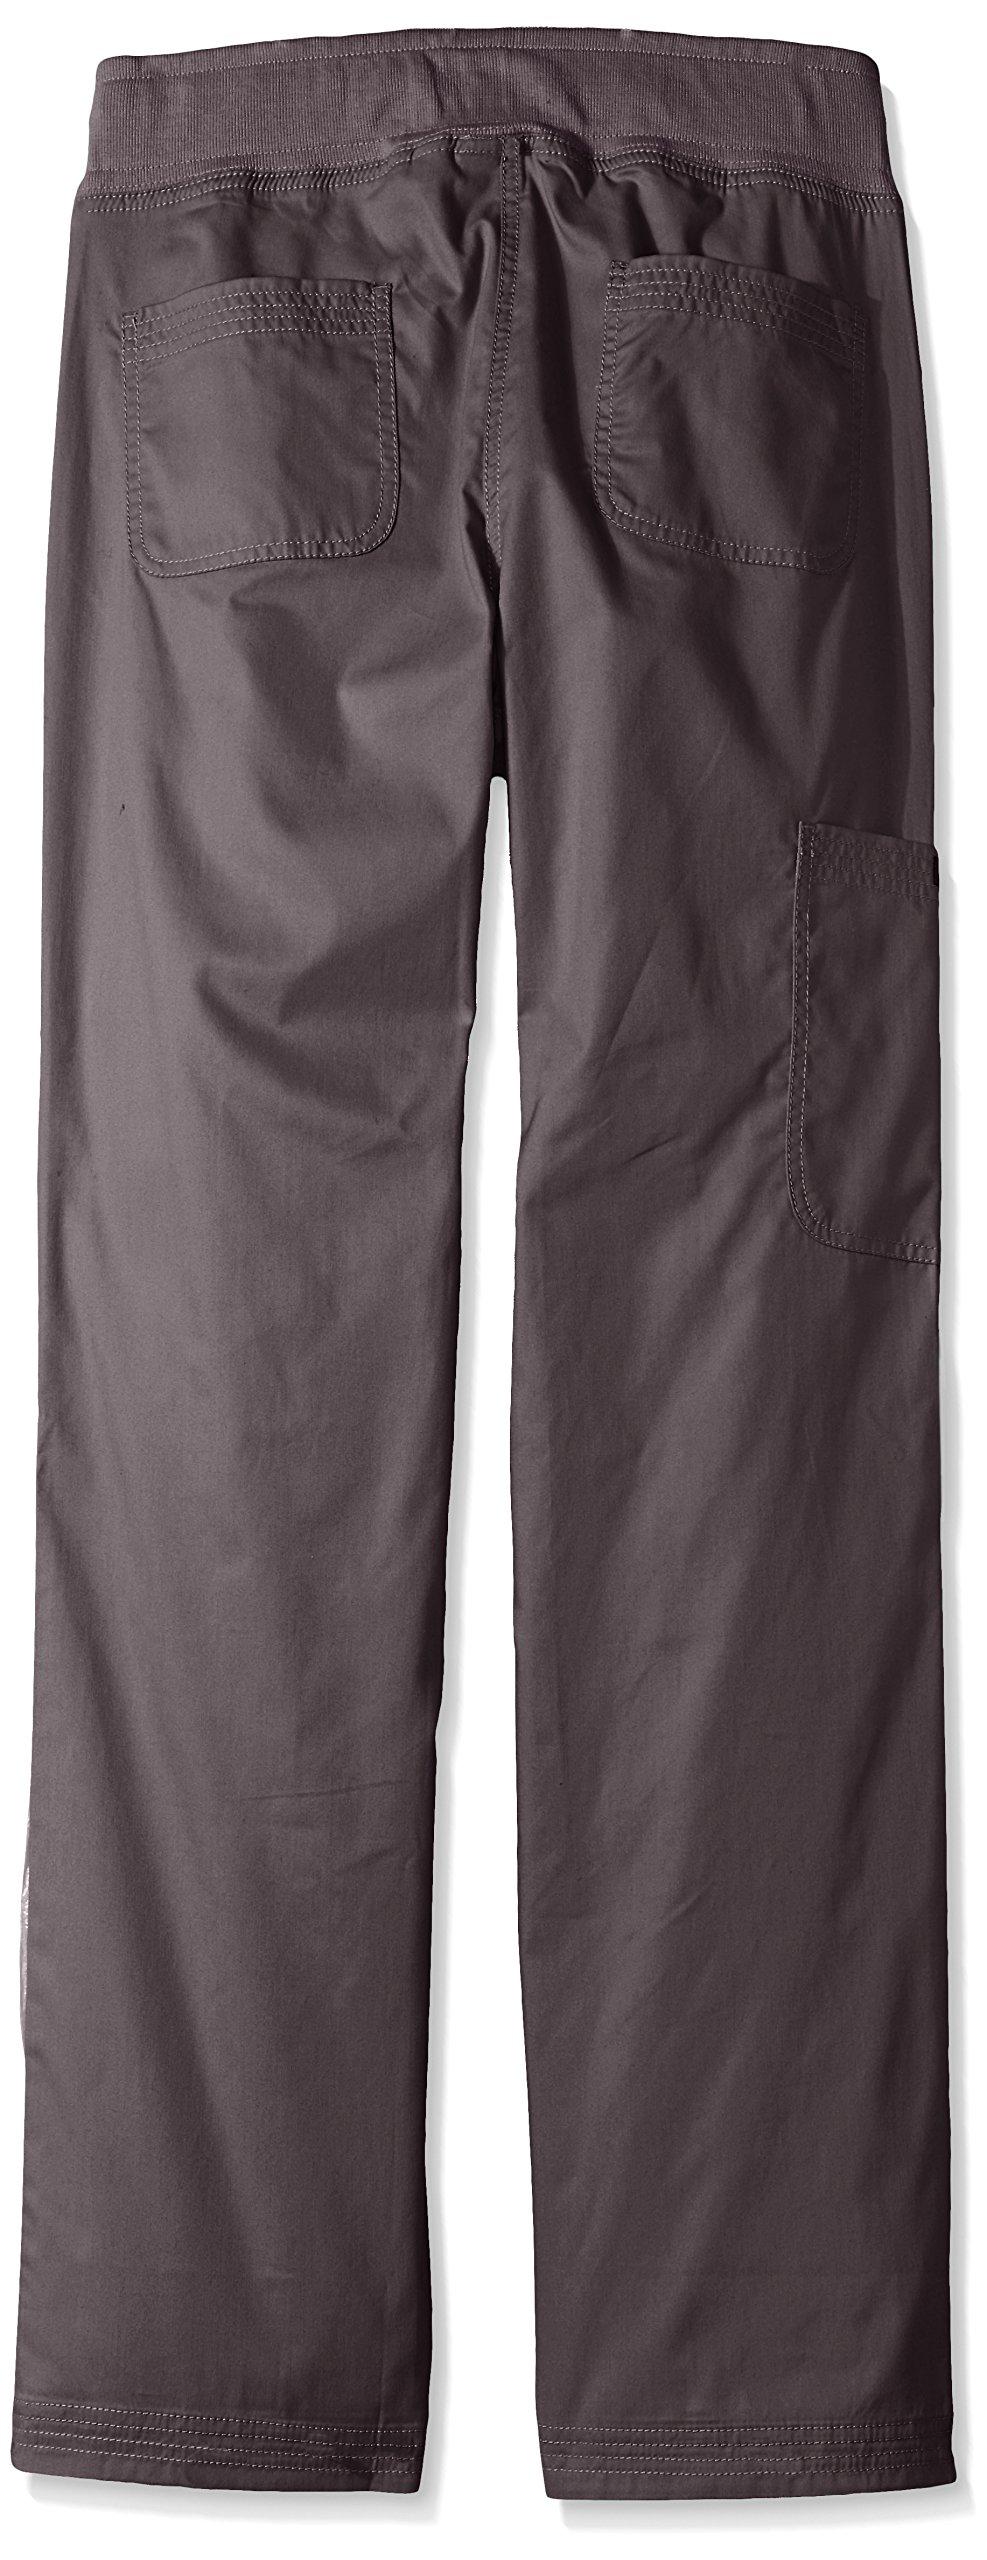 Koi Women S Tall Morgan Ultra Comfy Yoga Style Cargo Scrub Pants